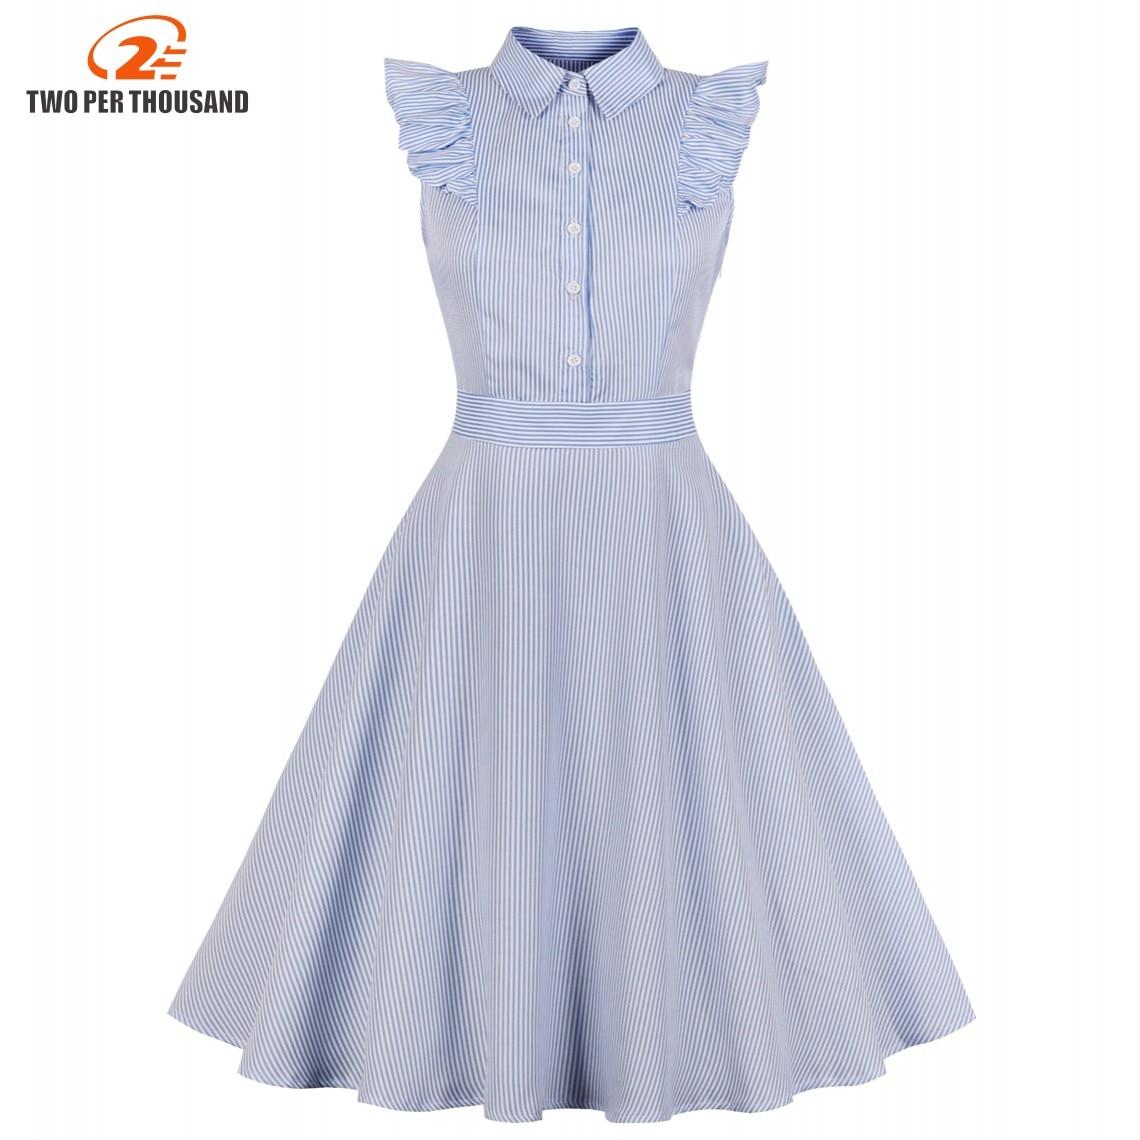 636aaa58f2798 SISHION Dandelions Print Vintage Dress 2019 New Sky Blue Plus Size ...